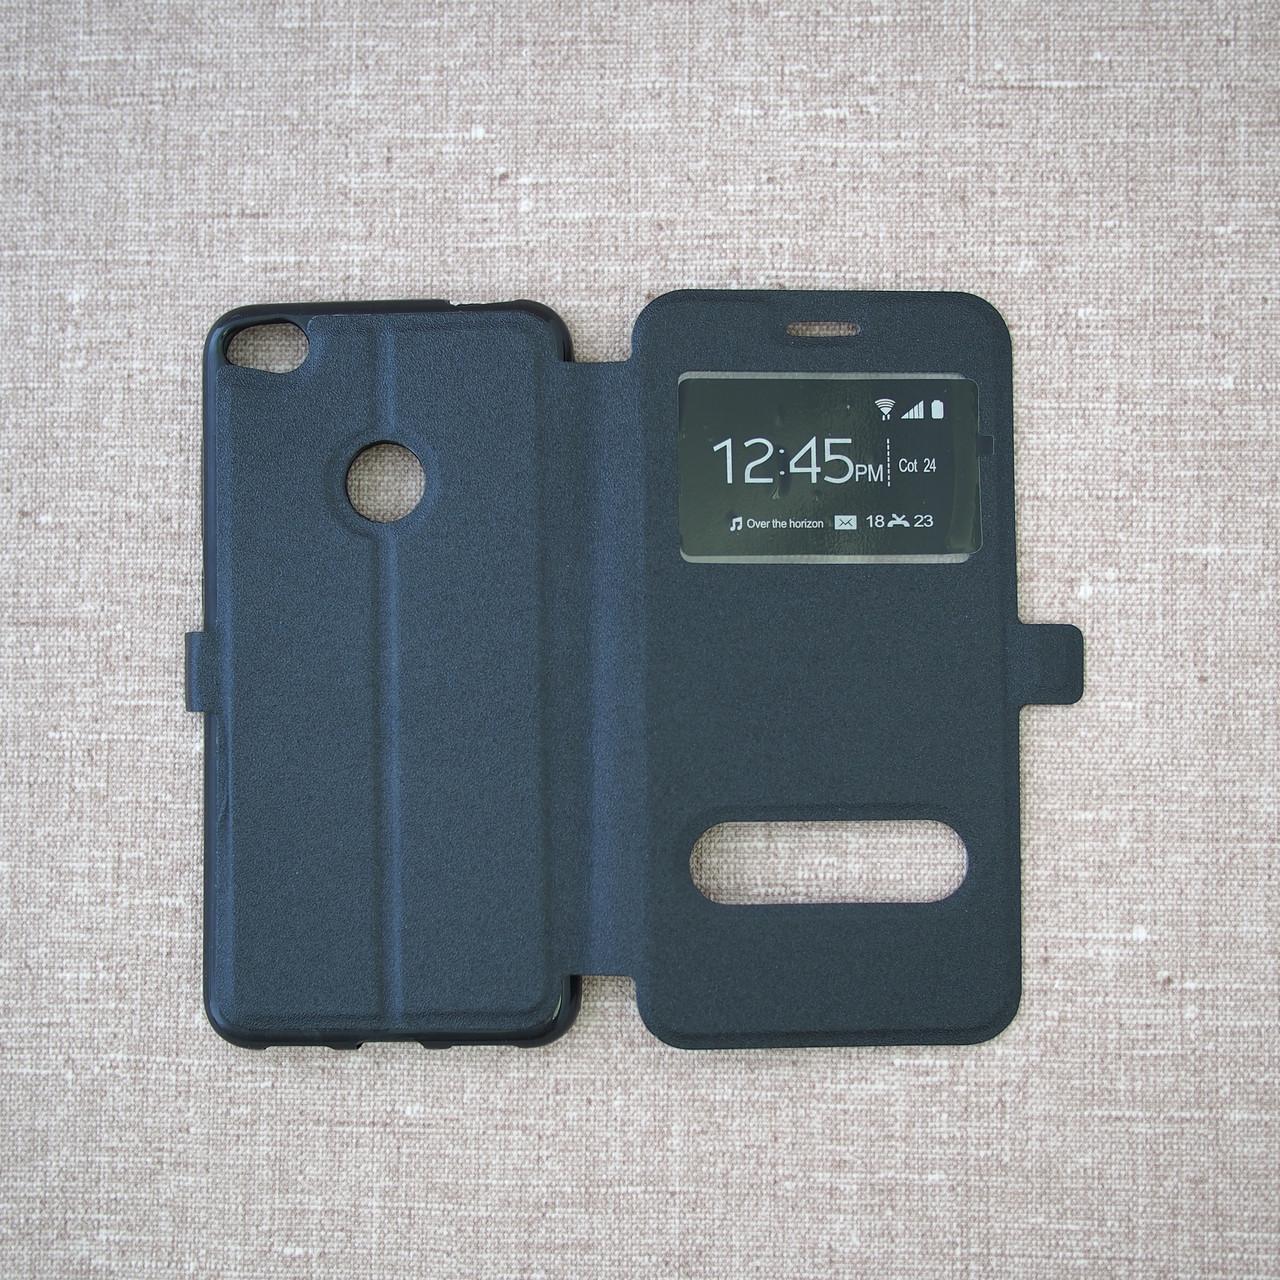 Window Huawei P8 Lite black Для телефона Черный